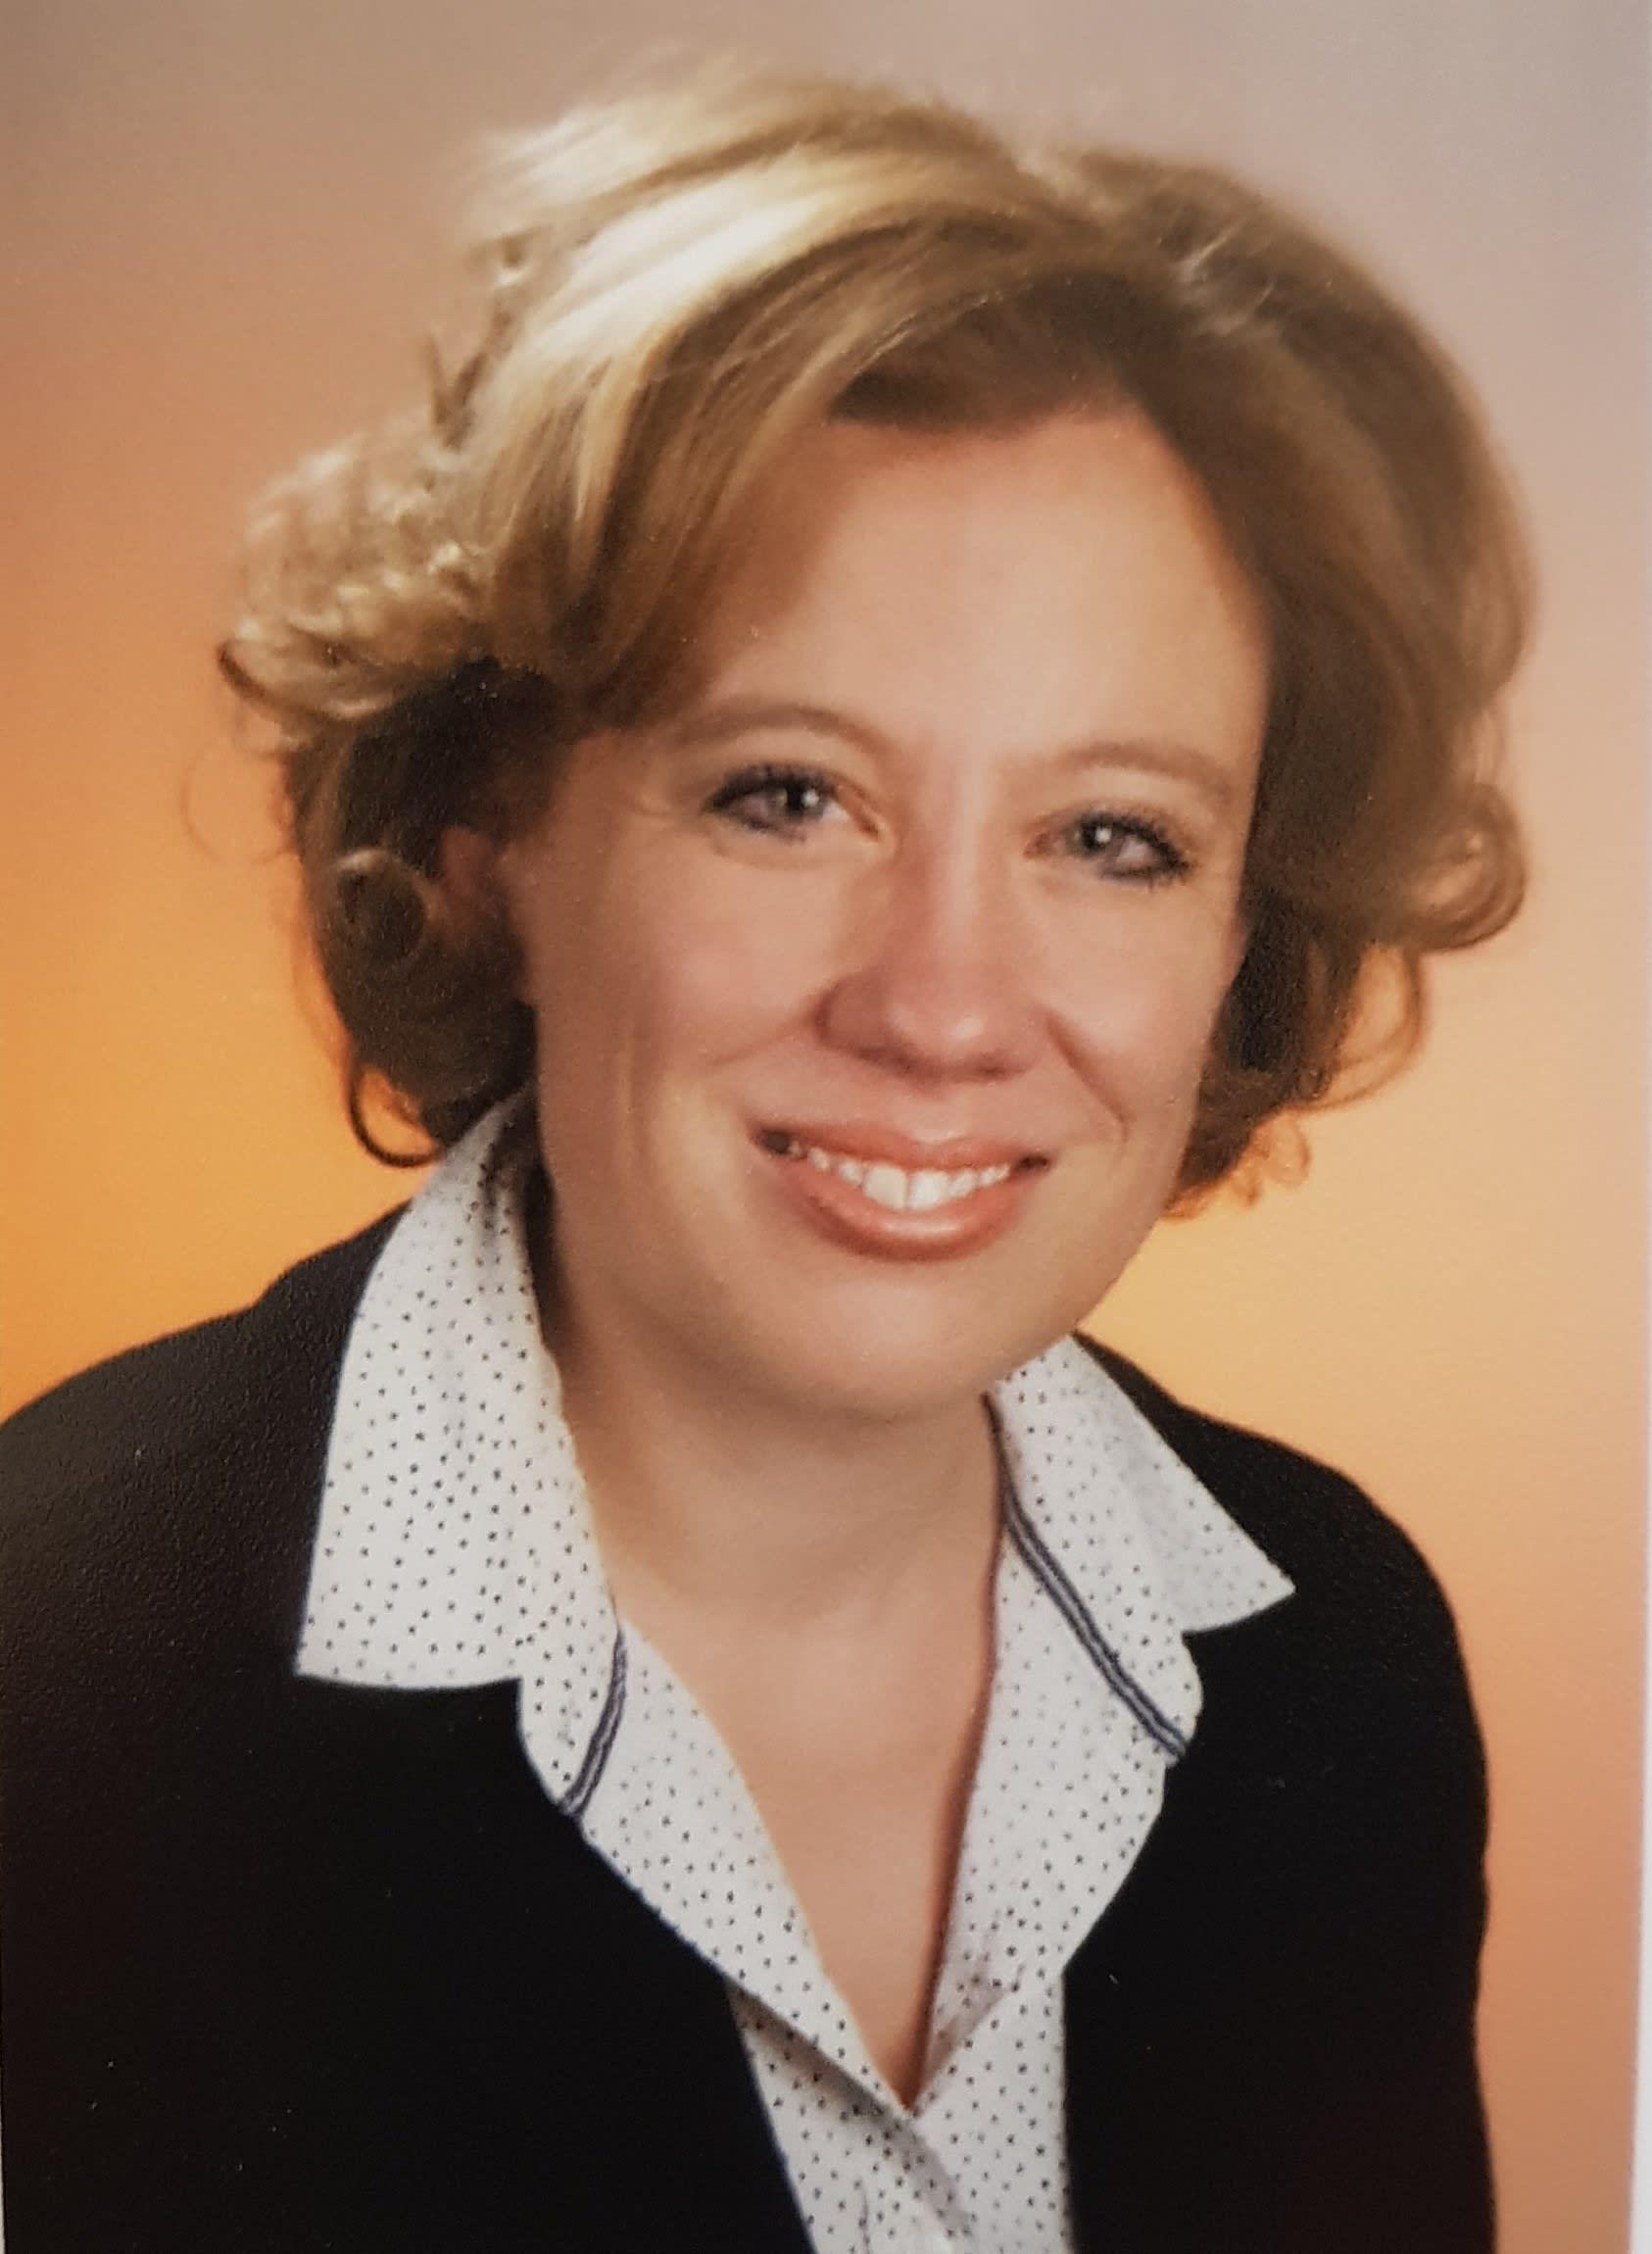 Melanie Eberhardt Projektleiterin Jugend forscht regional ZFC